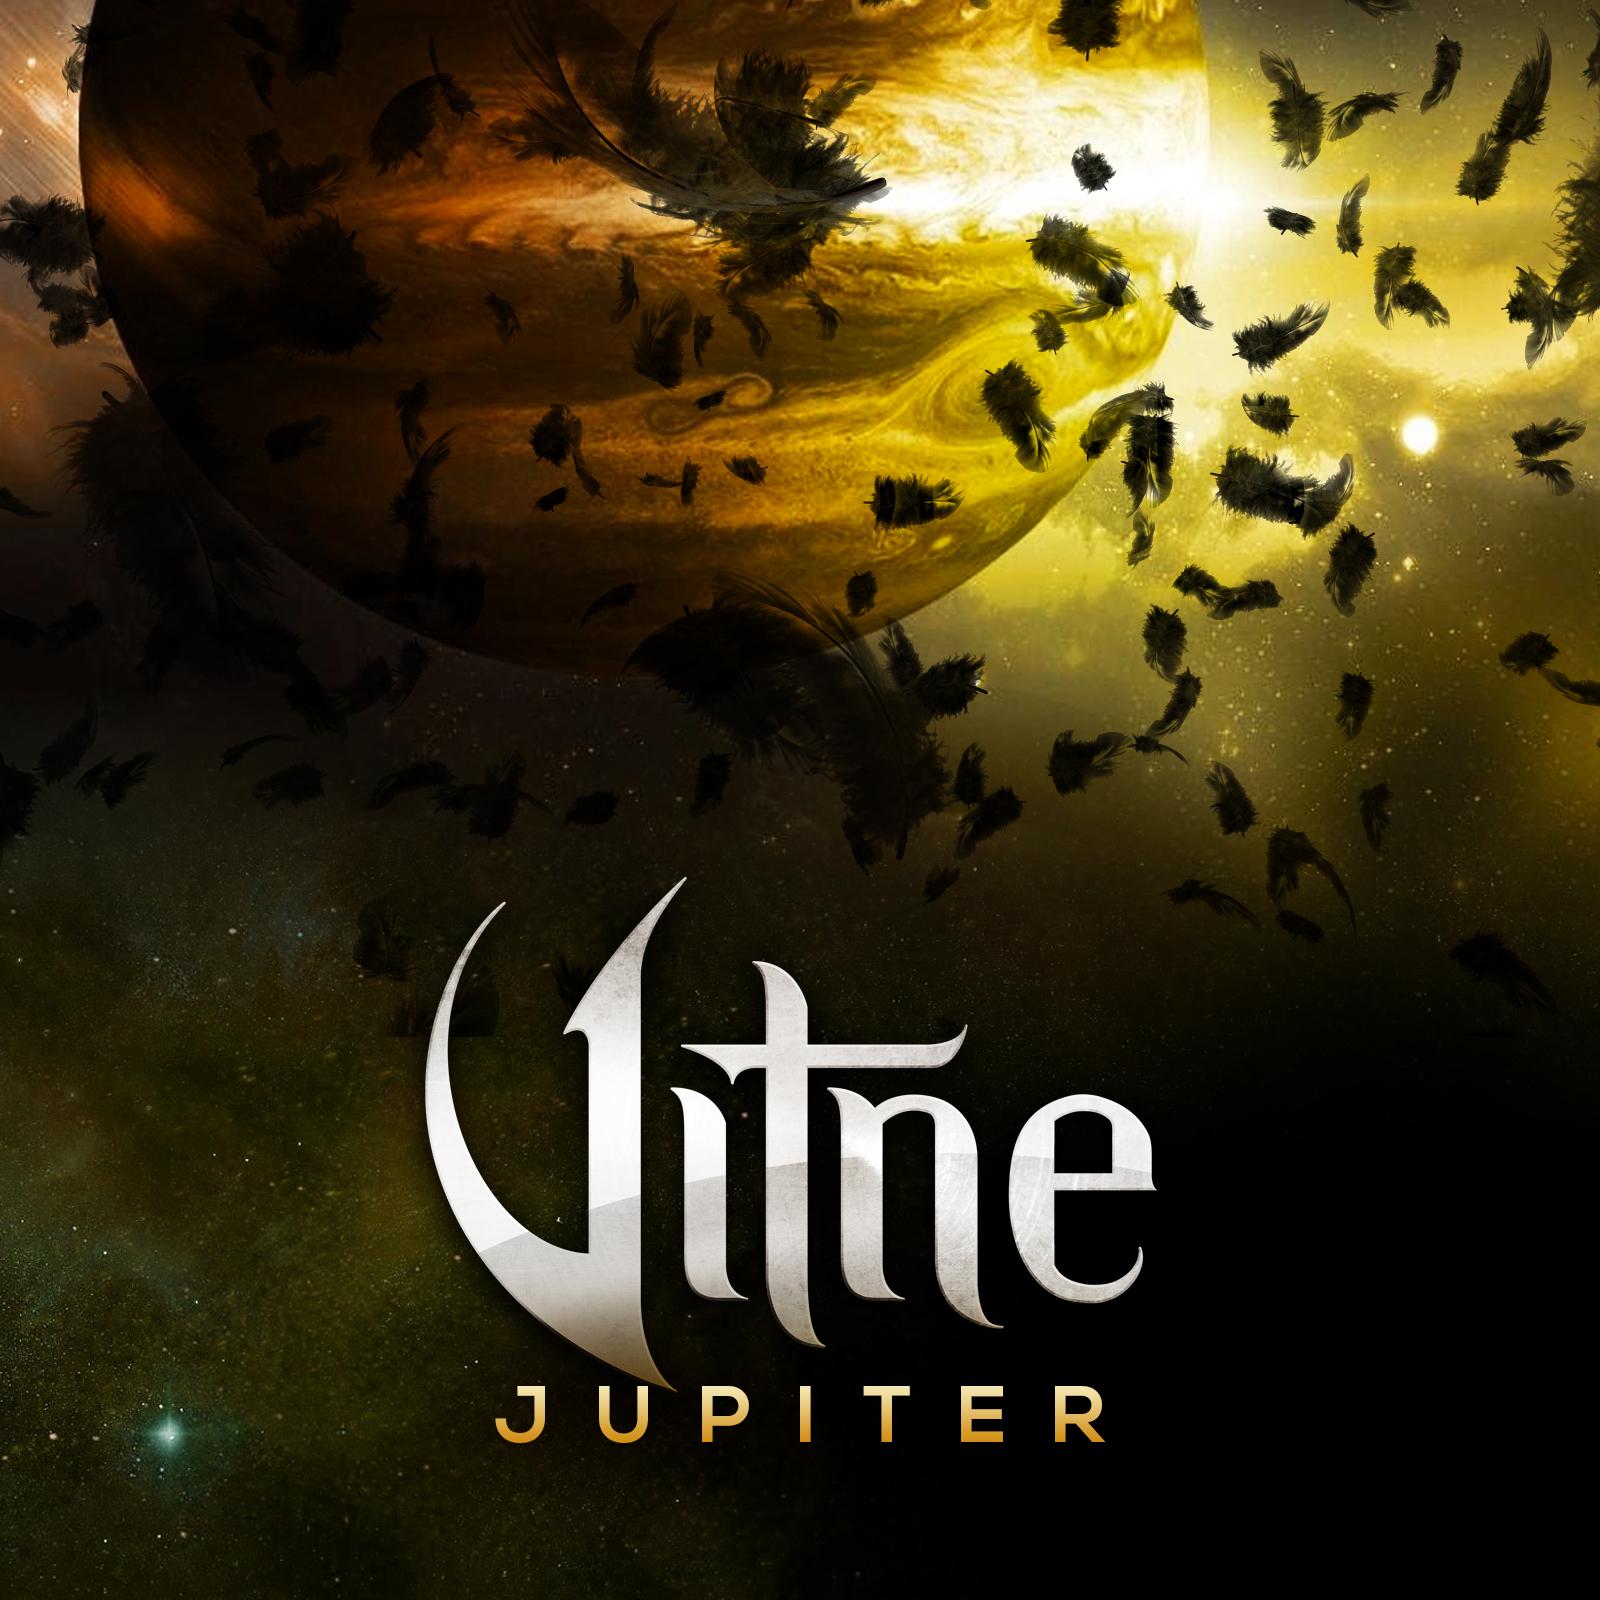 New Vitne album 2017 Jupiter